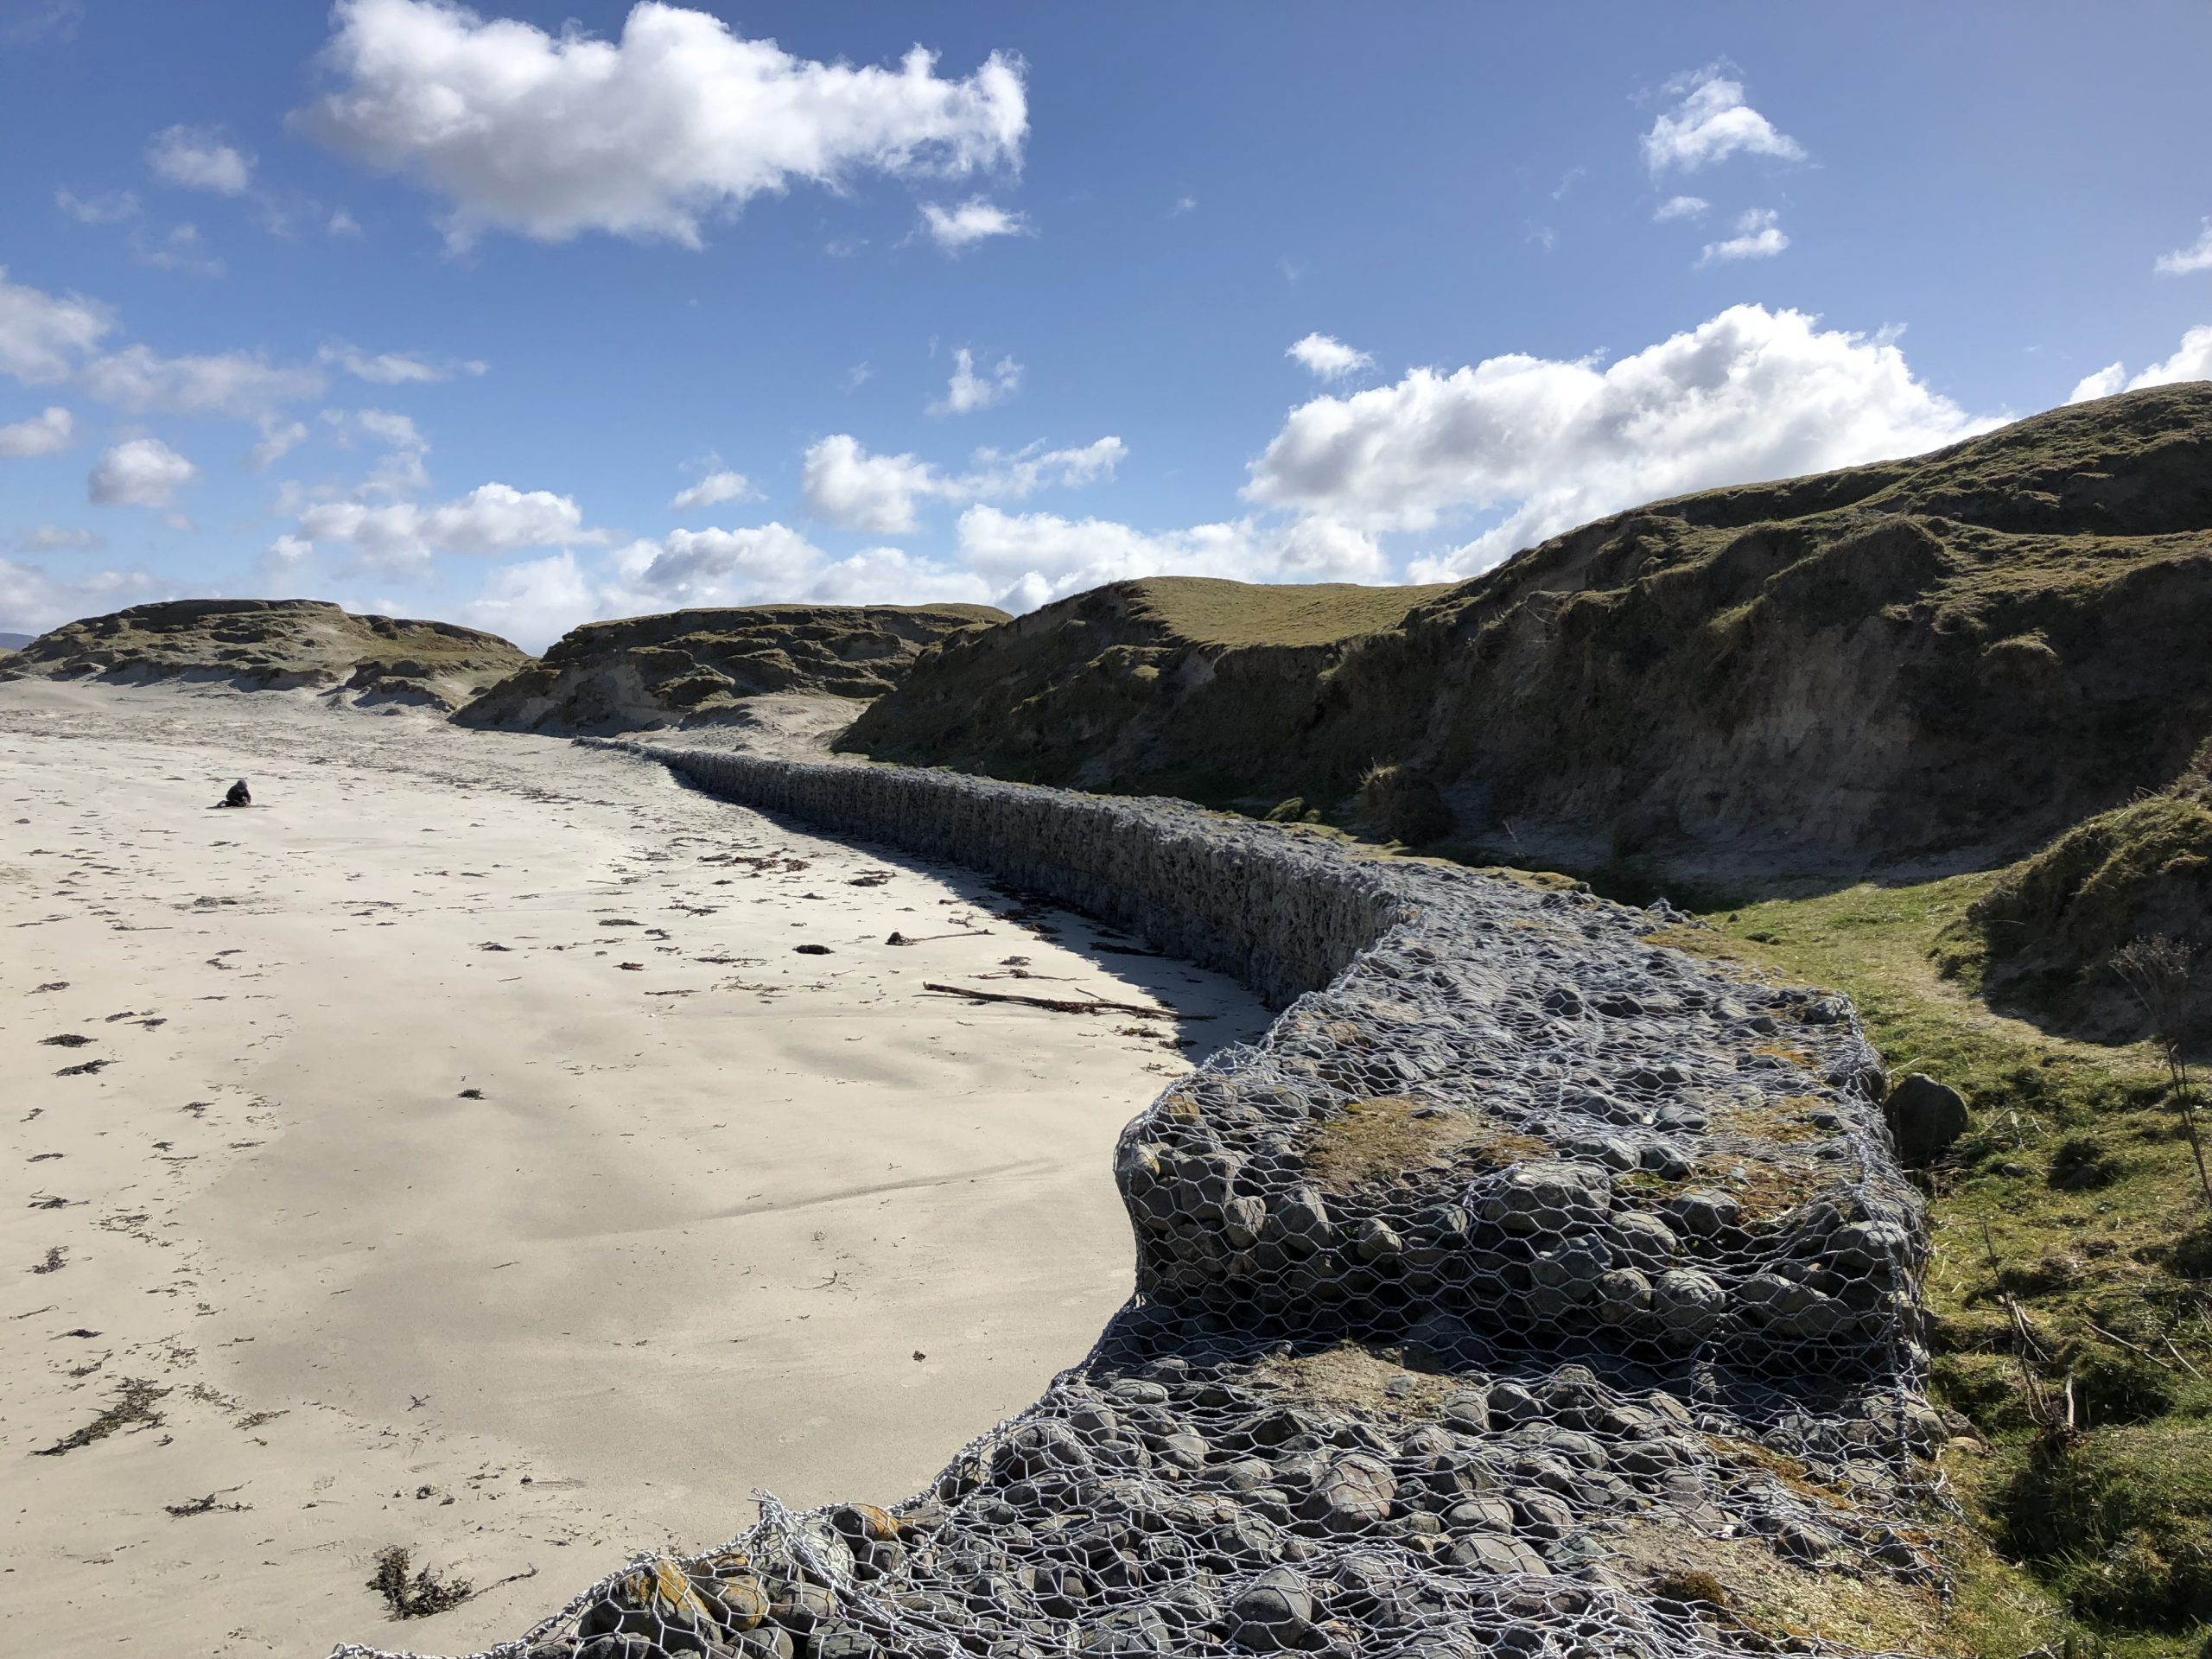 beachside rocks and sand